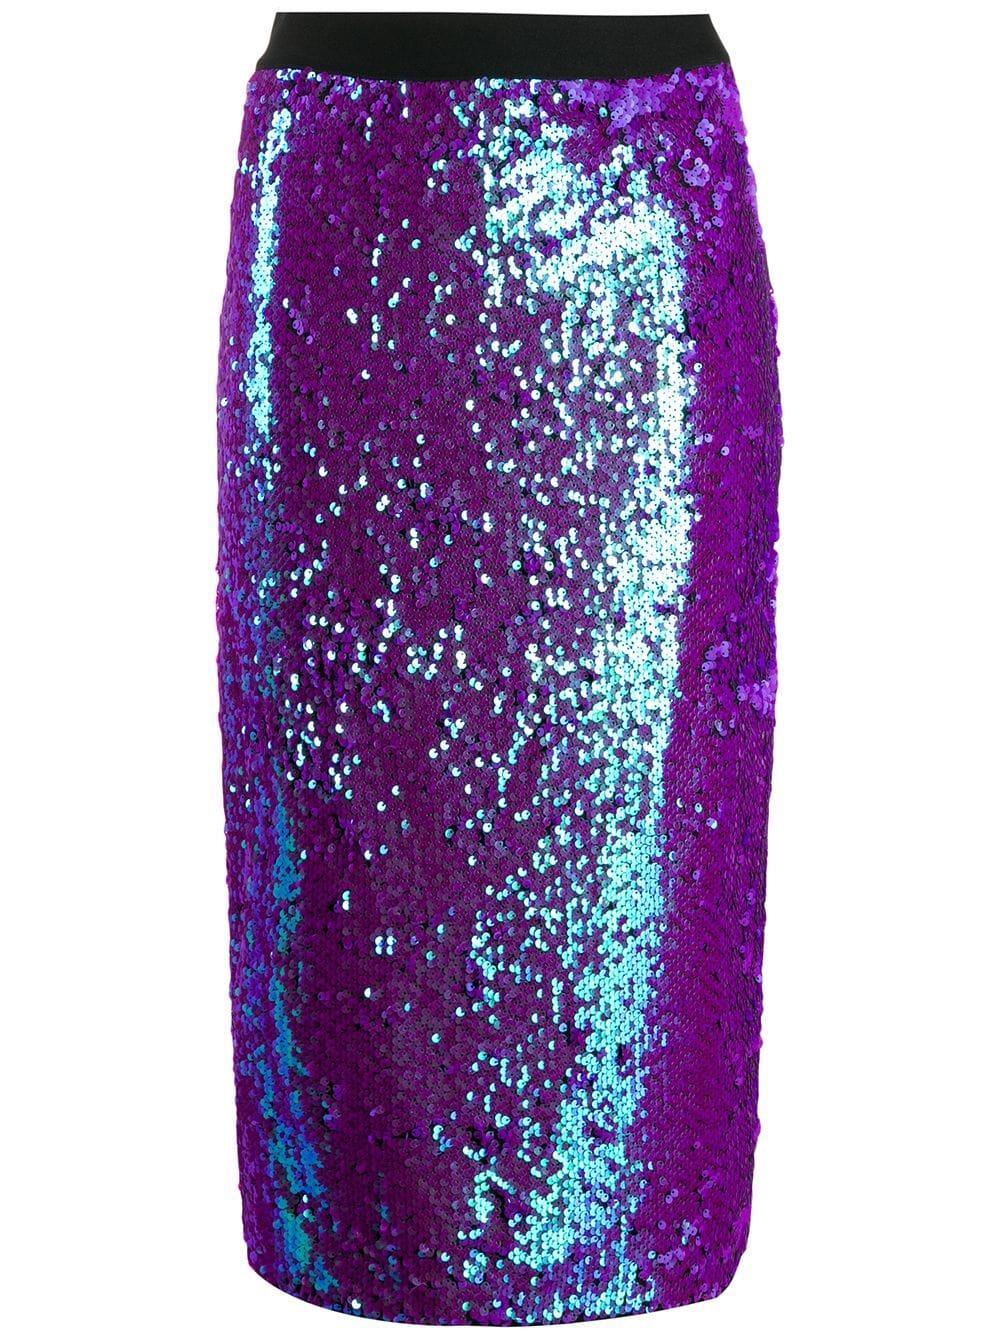 Essentiel Antwerp юбка-карандаш Temptation с пайетками